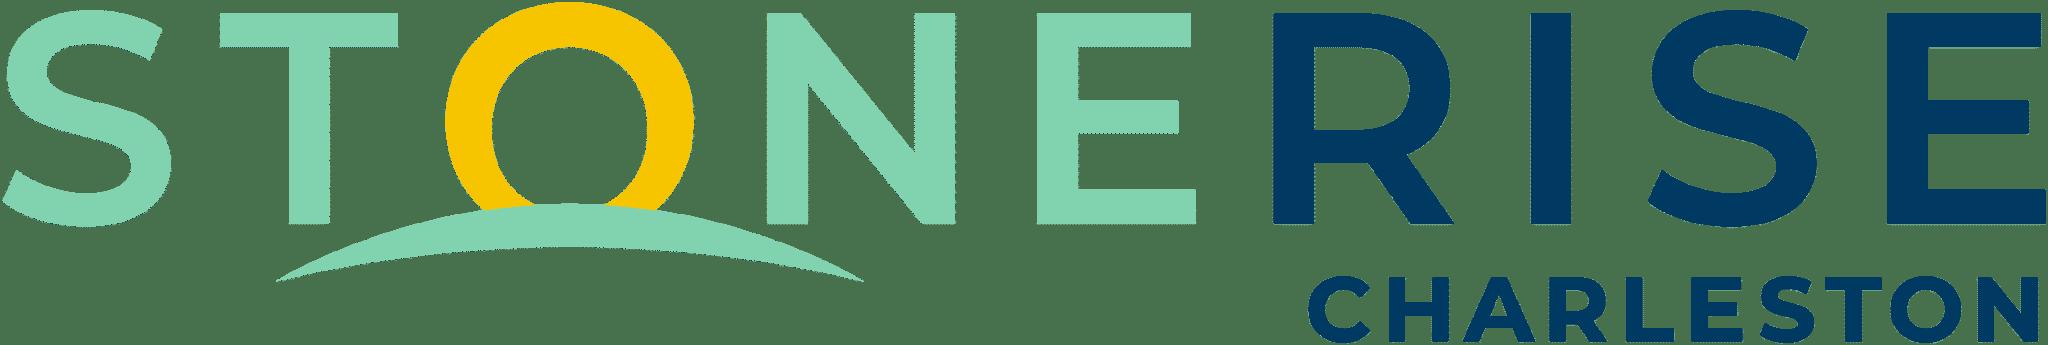 https://camcfoundation.org/wp-content/uploads/2021/04/Stonerise-primary-logo-RGB.png